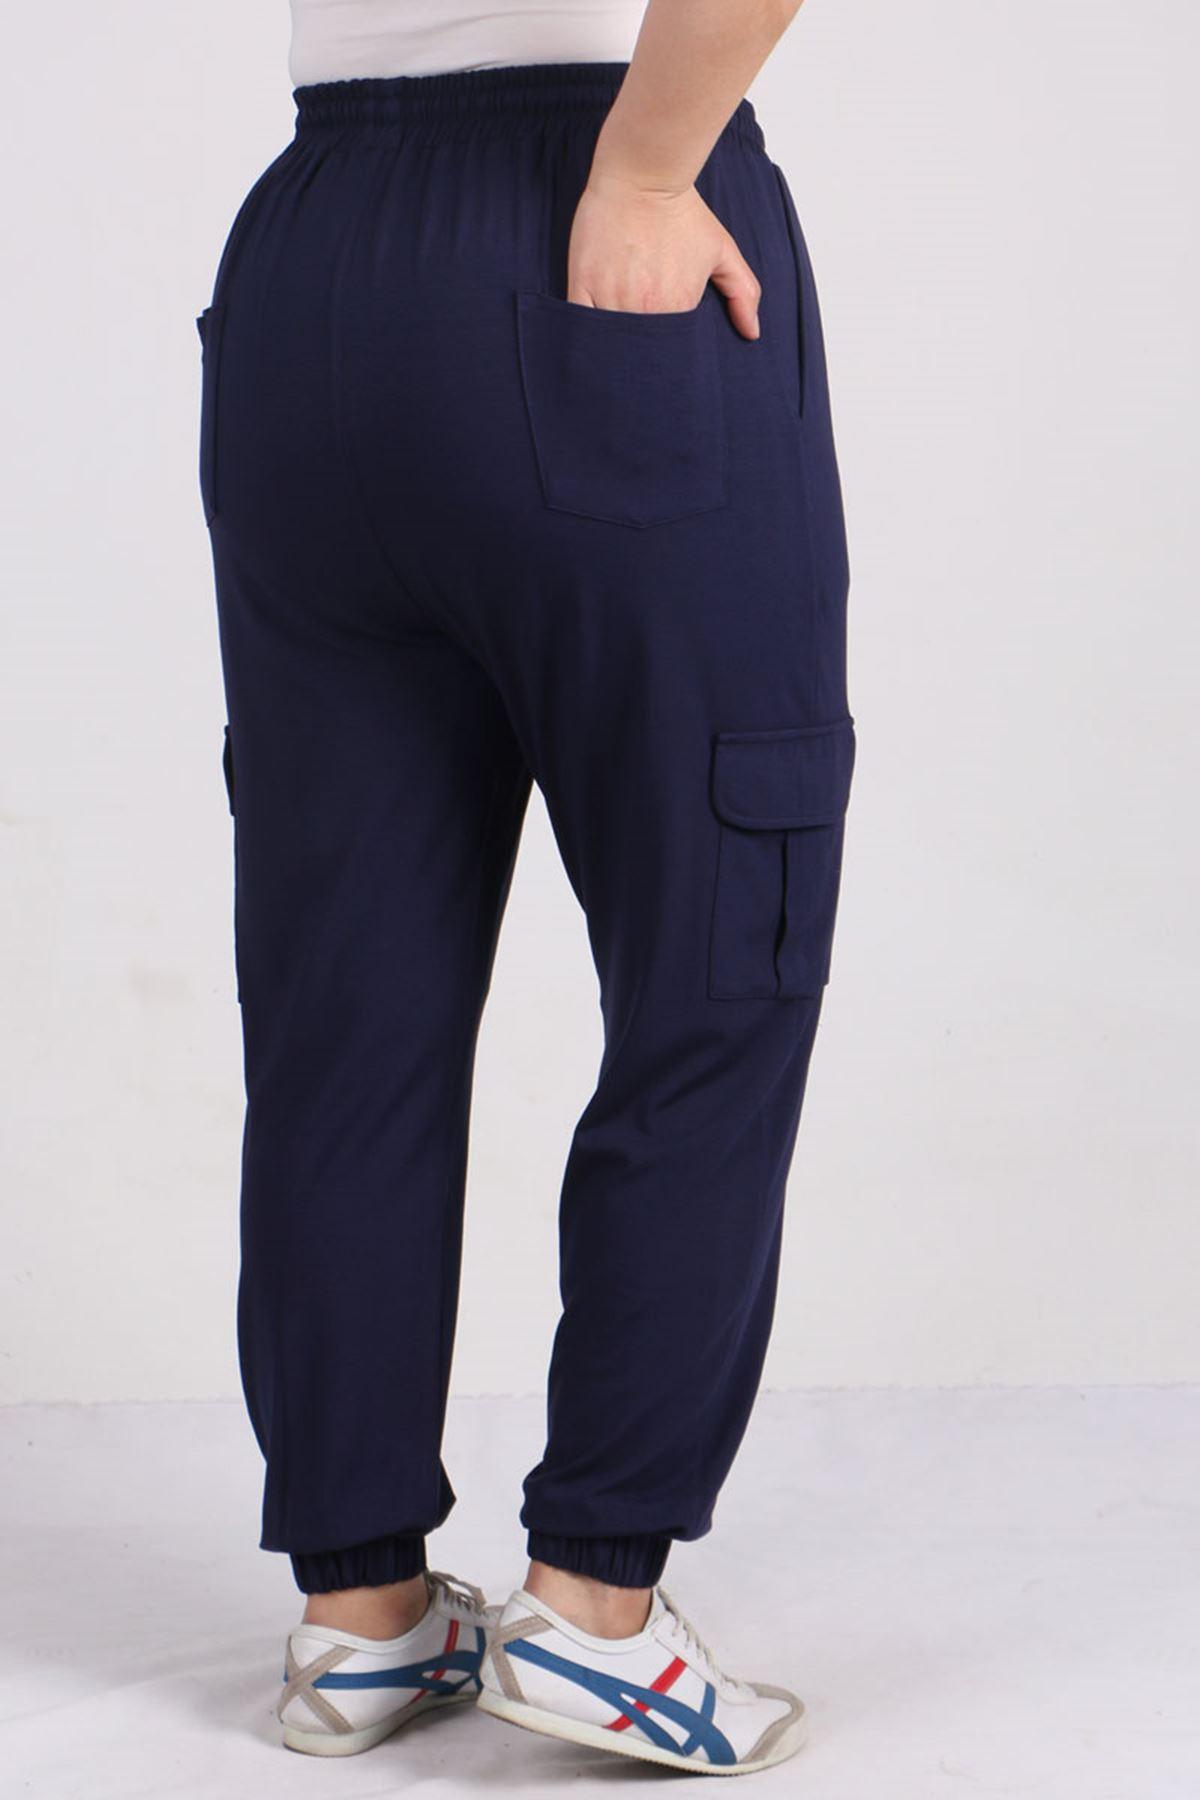 9150 Büyük Beden Lastikli Penye Pantolon - Lacivert